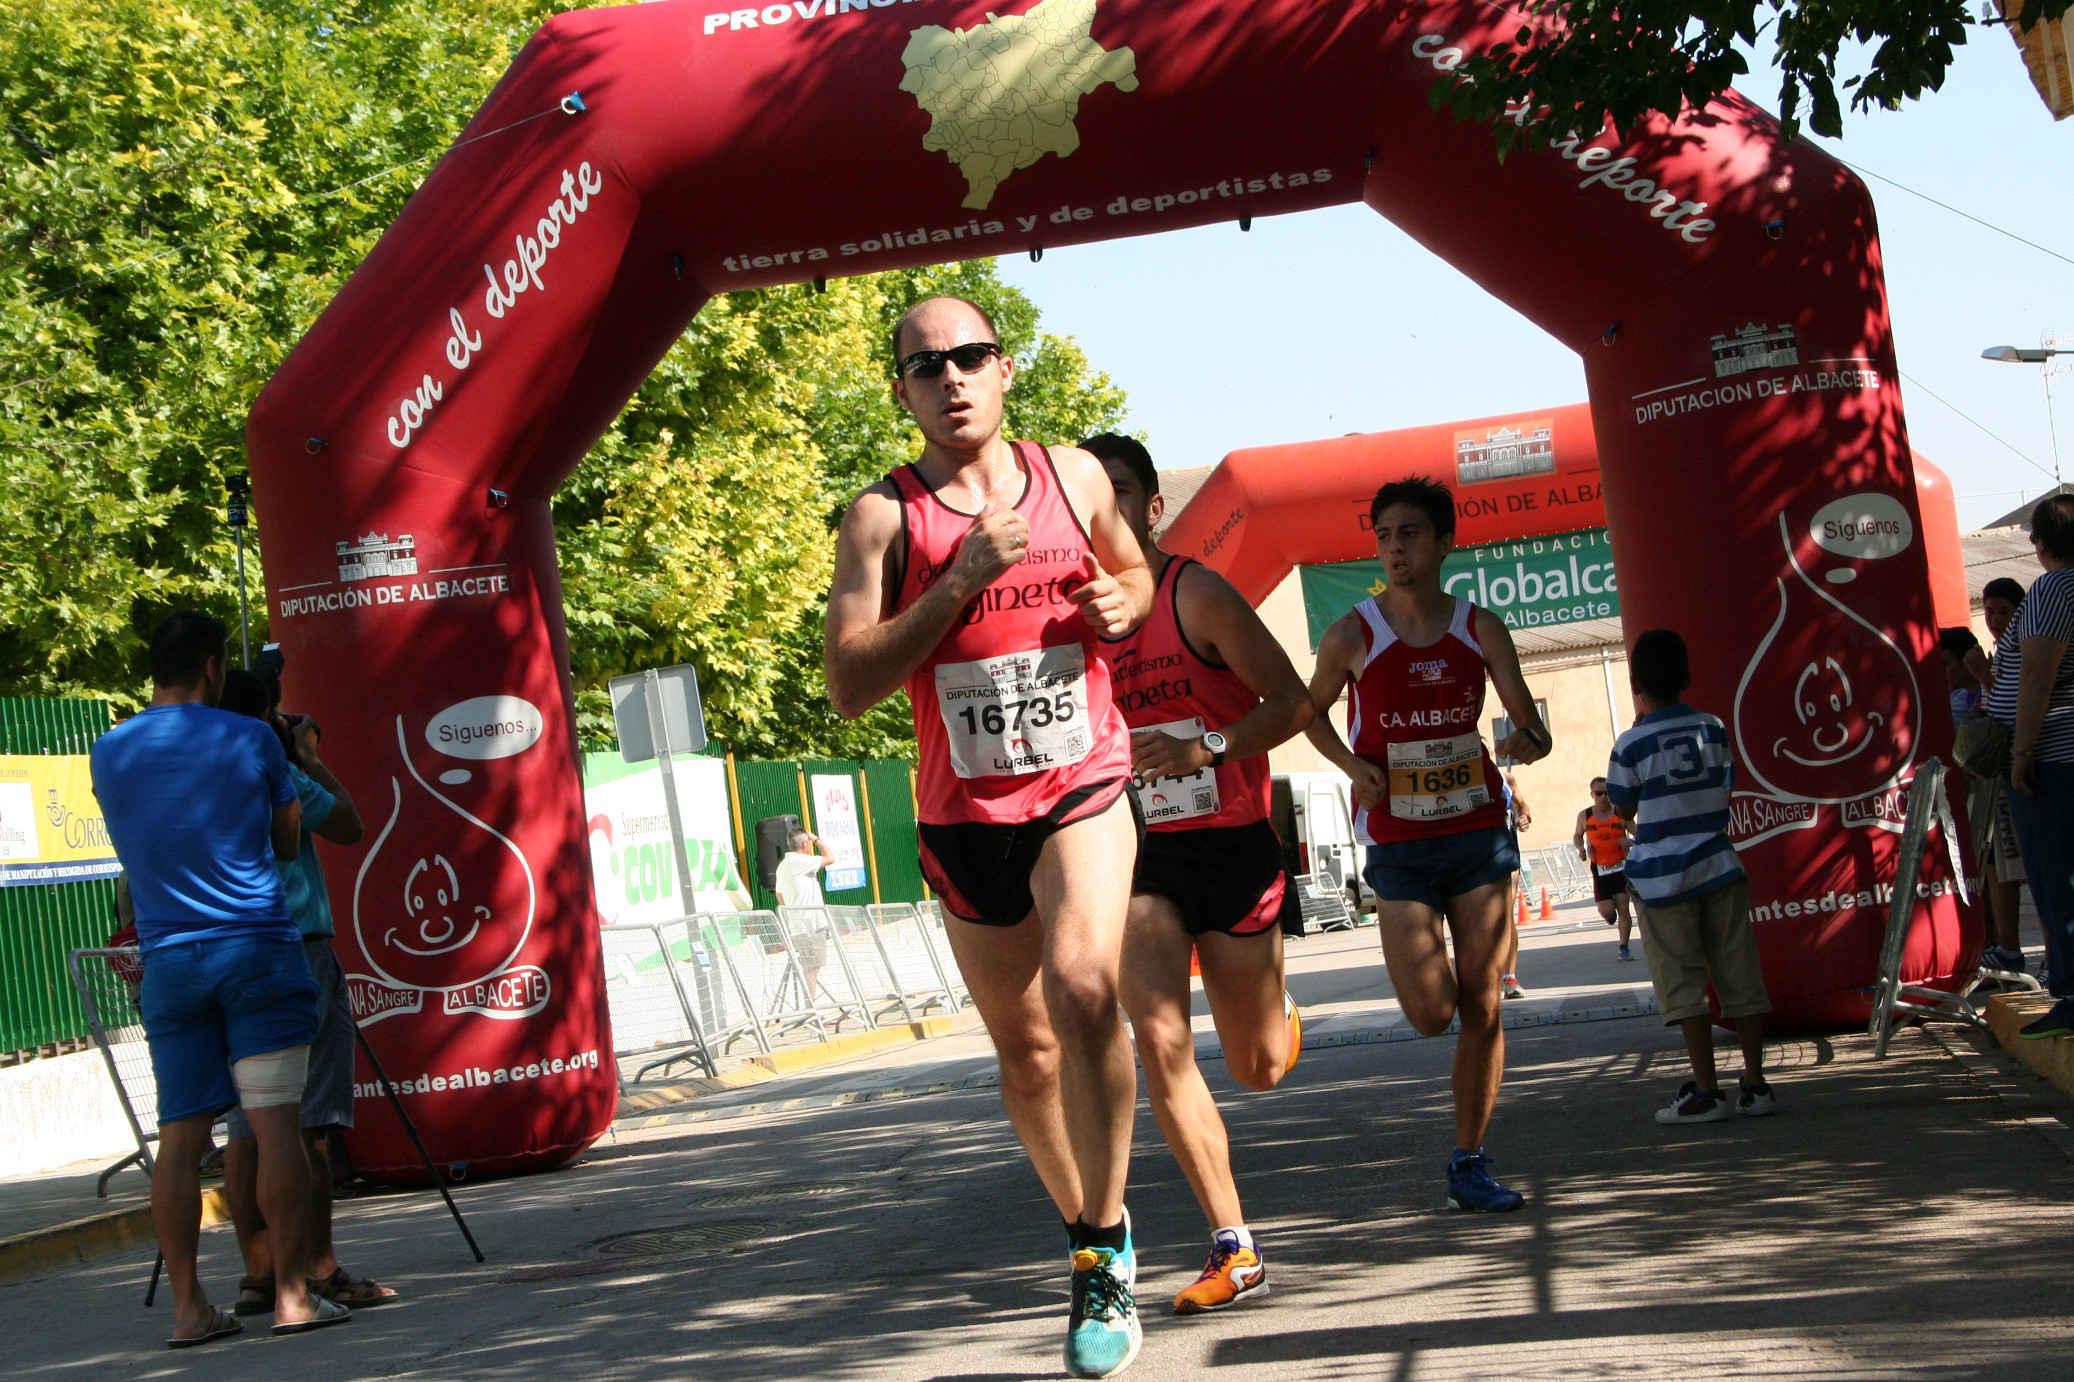 Atletas populares en la VIII Carrera Popular de La Gineta